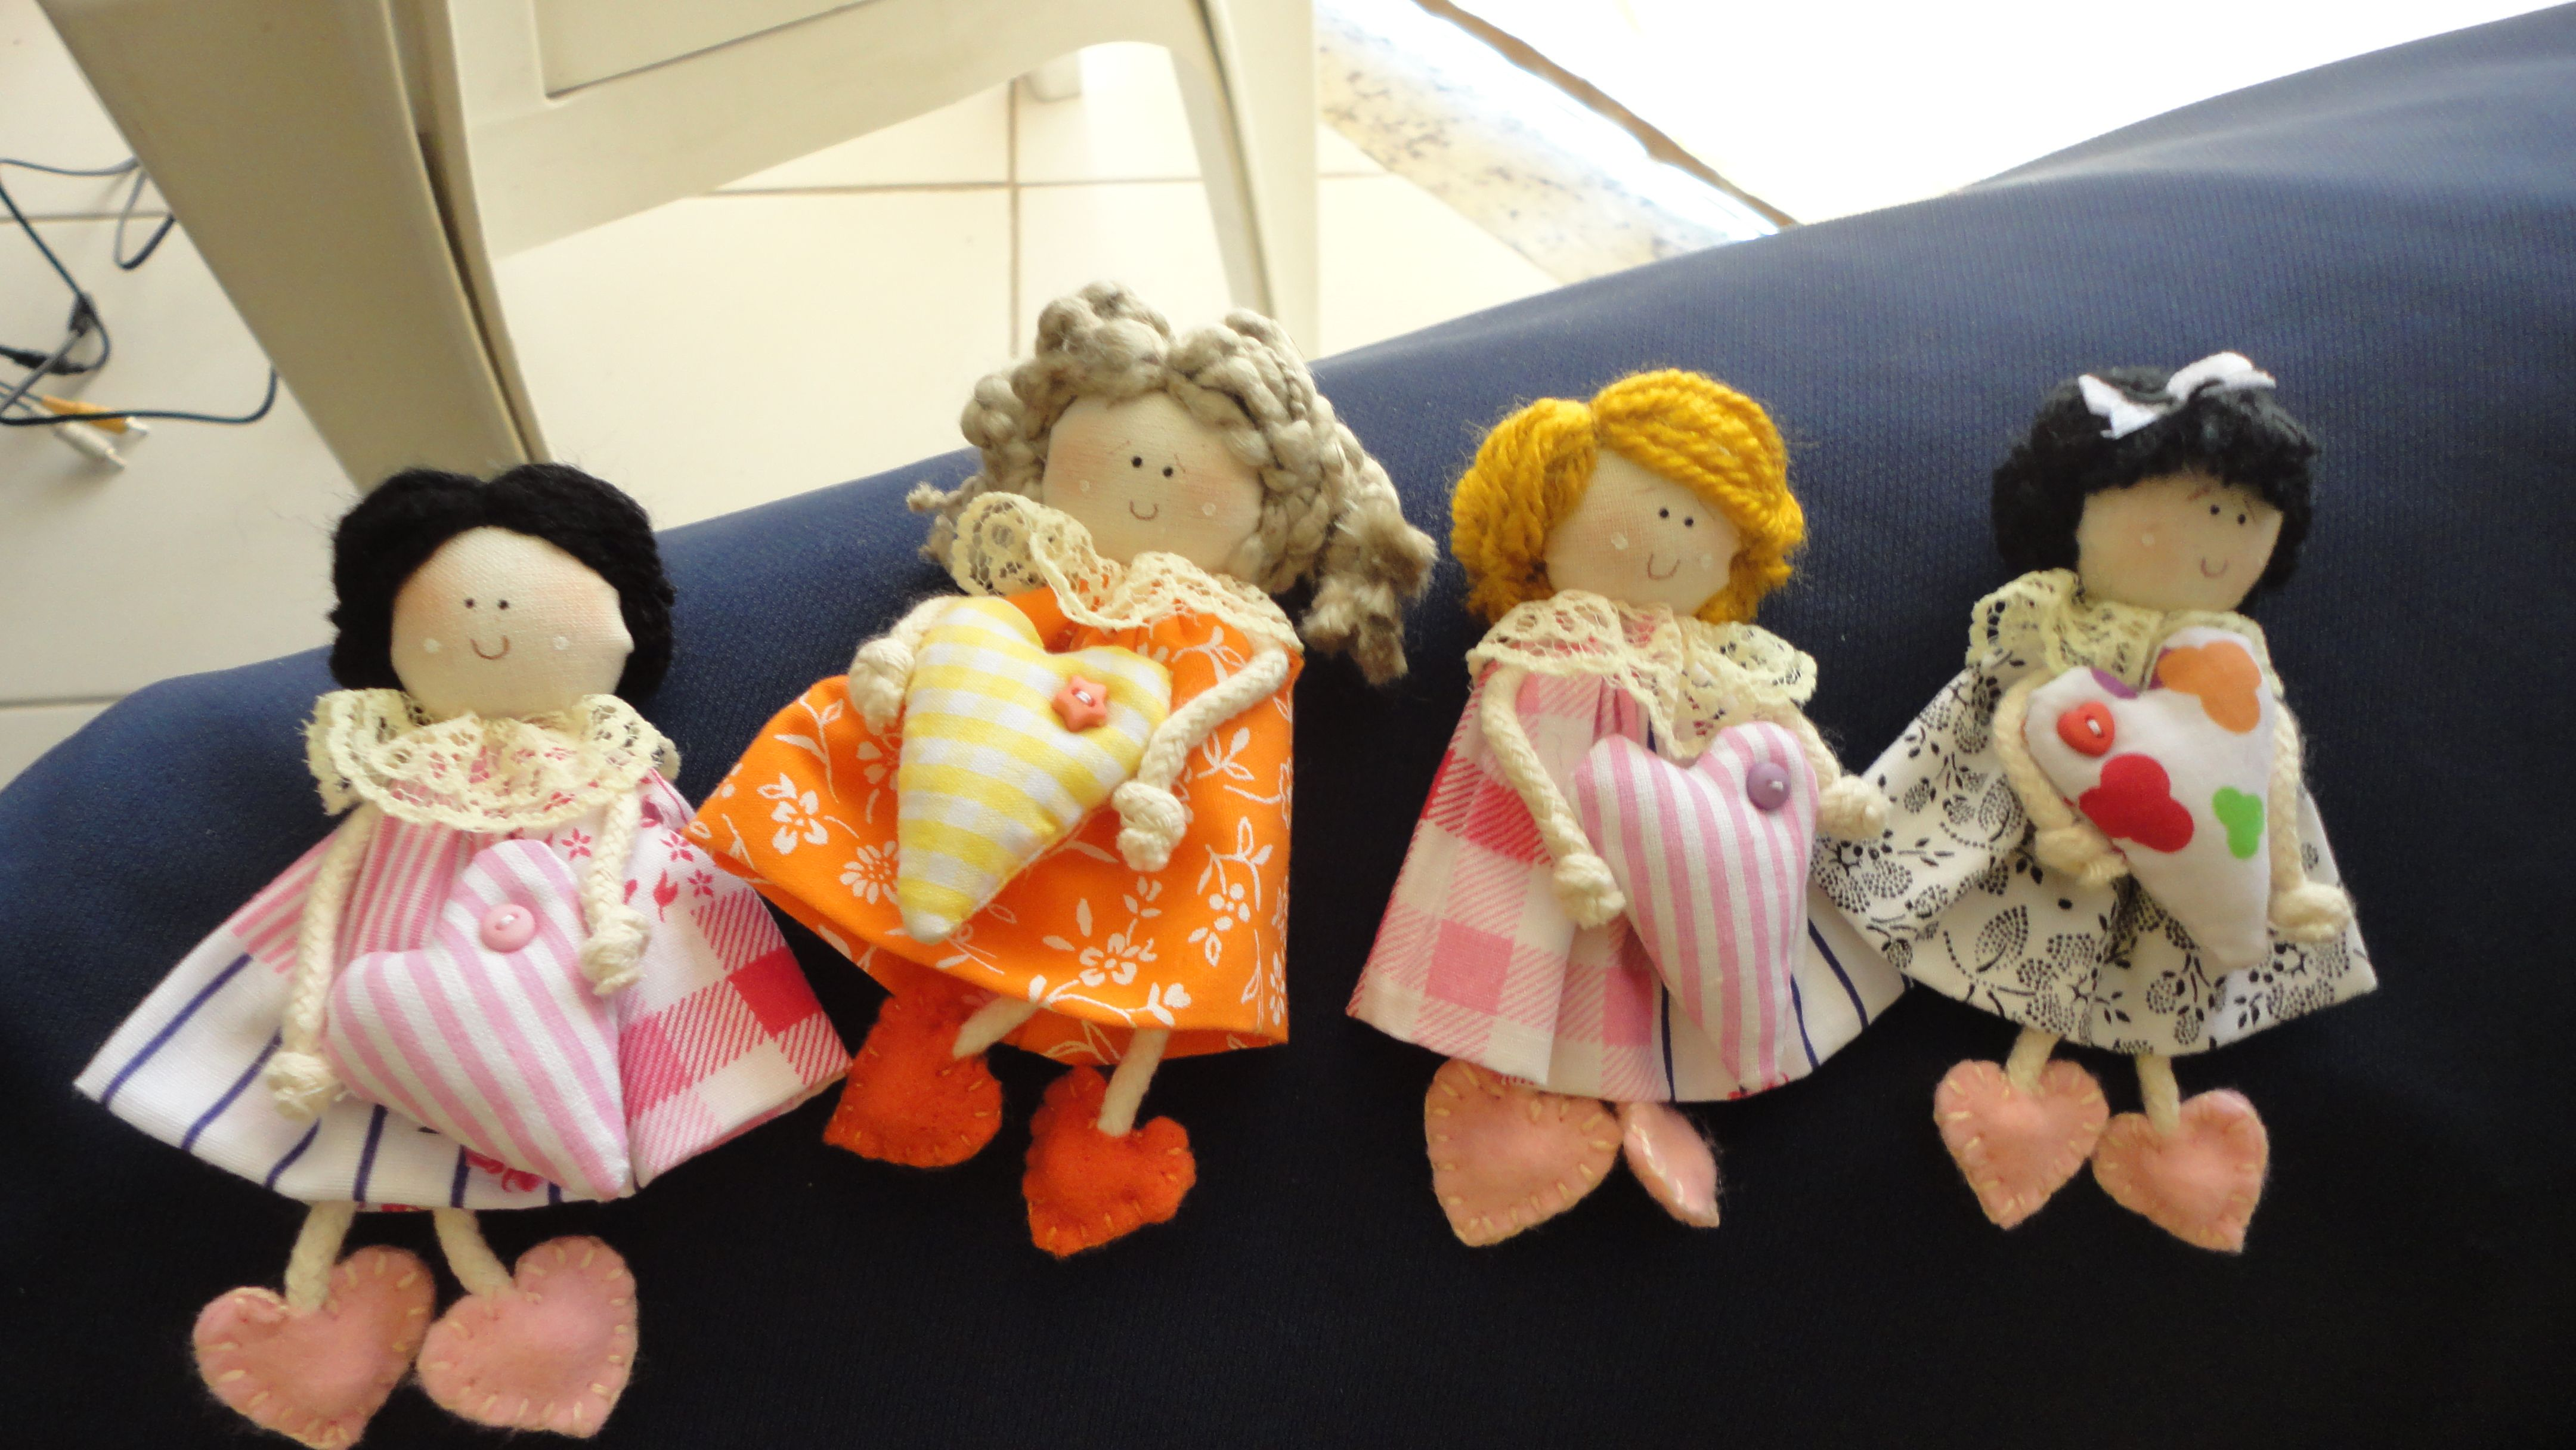 Mini Bonecas sachê.